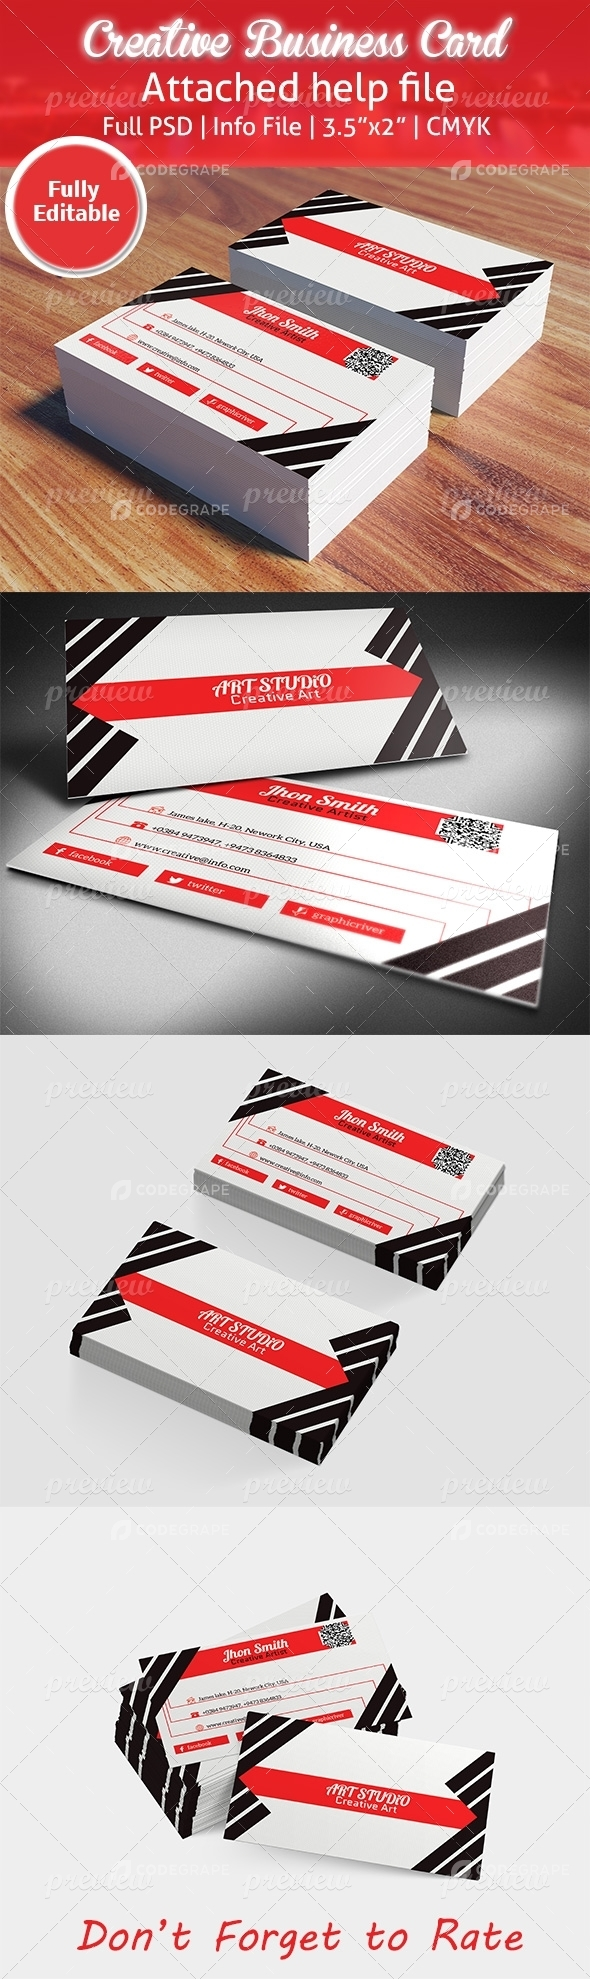 Creative Business Card 11